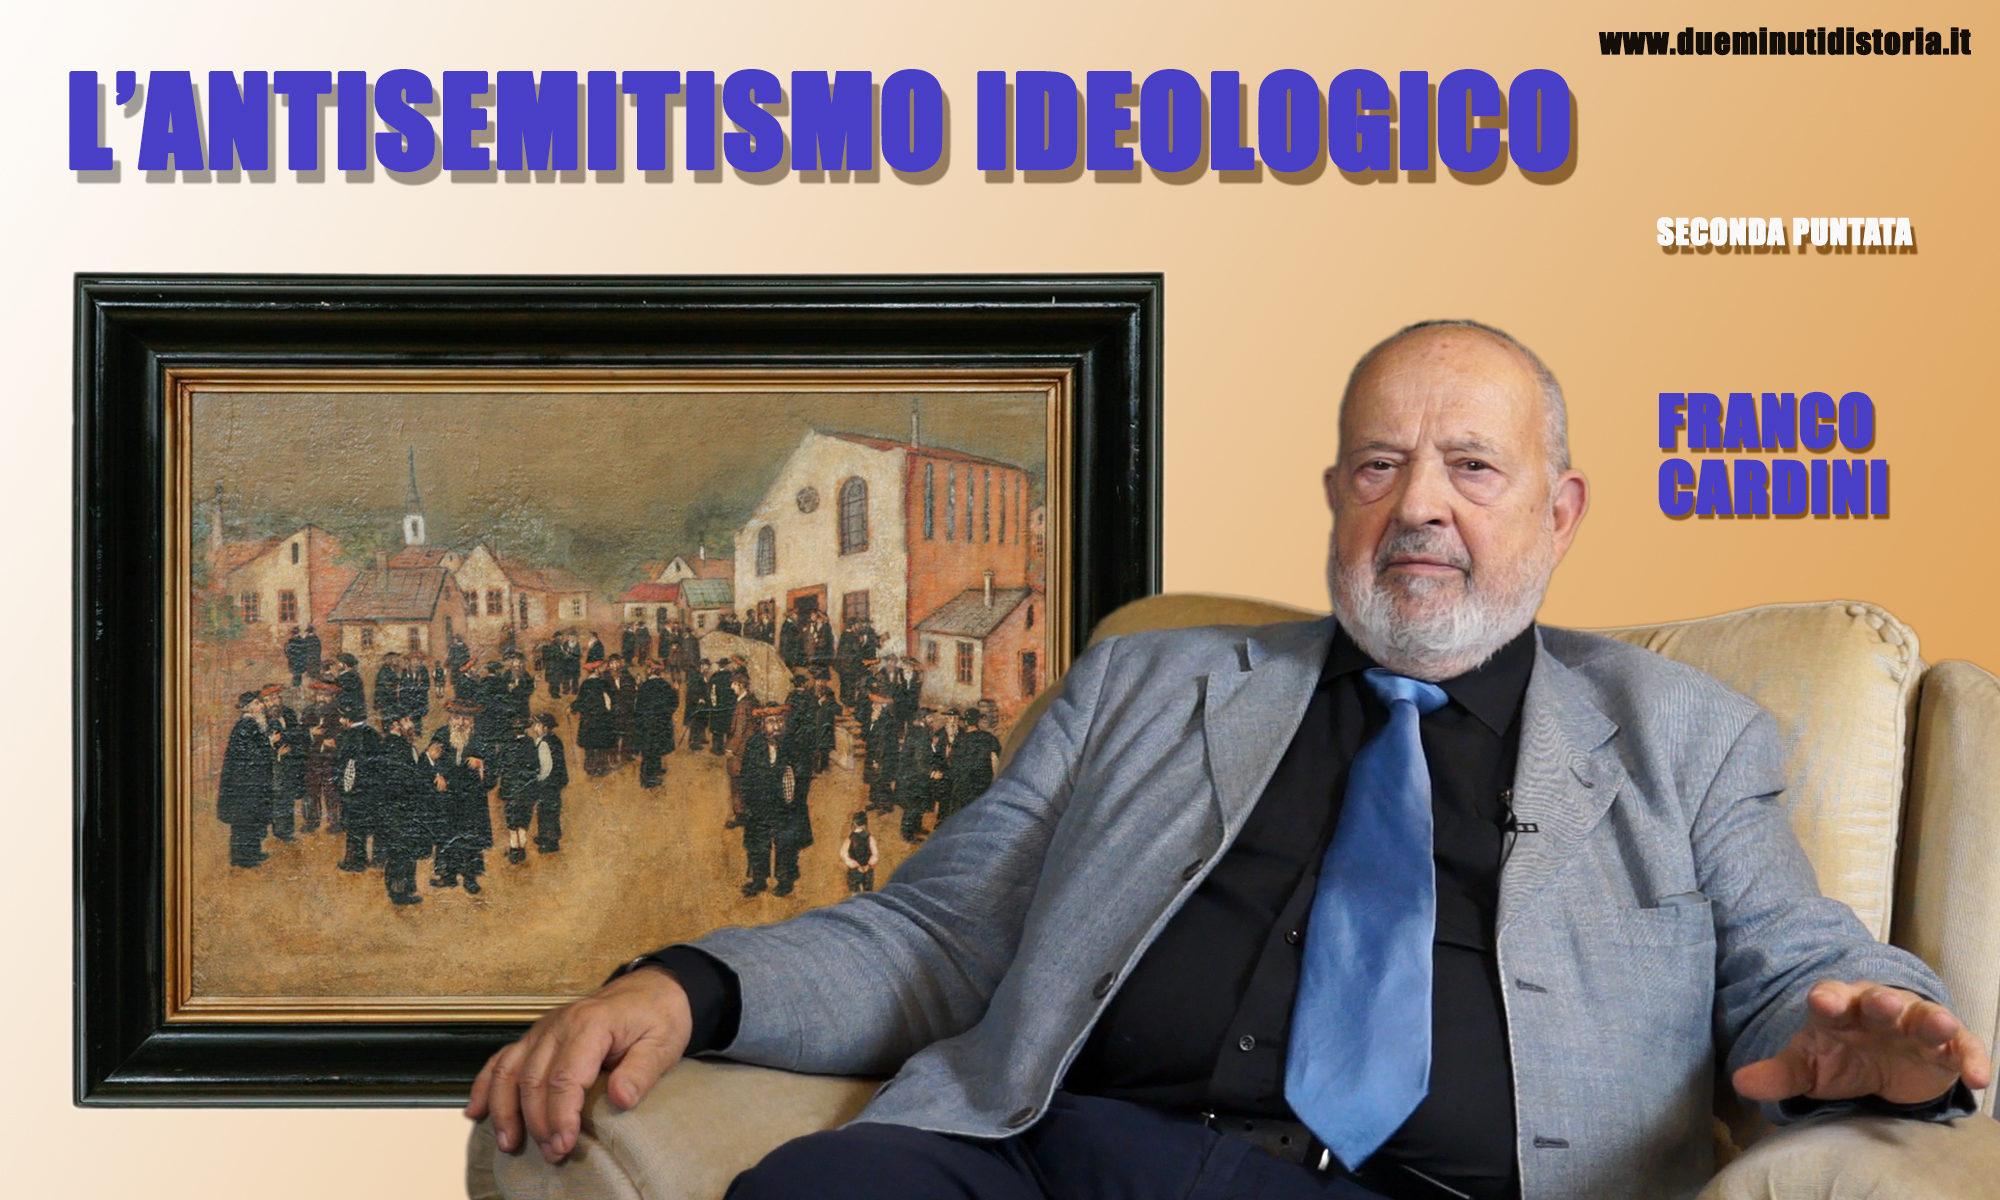 Franco Cardini: l'antisemitismo ideologico